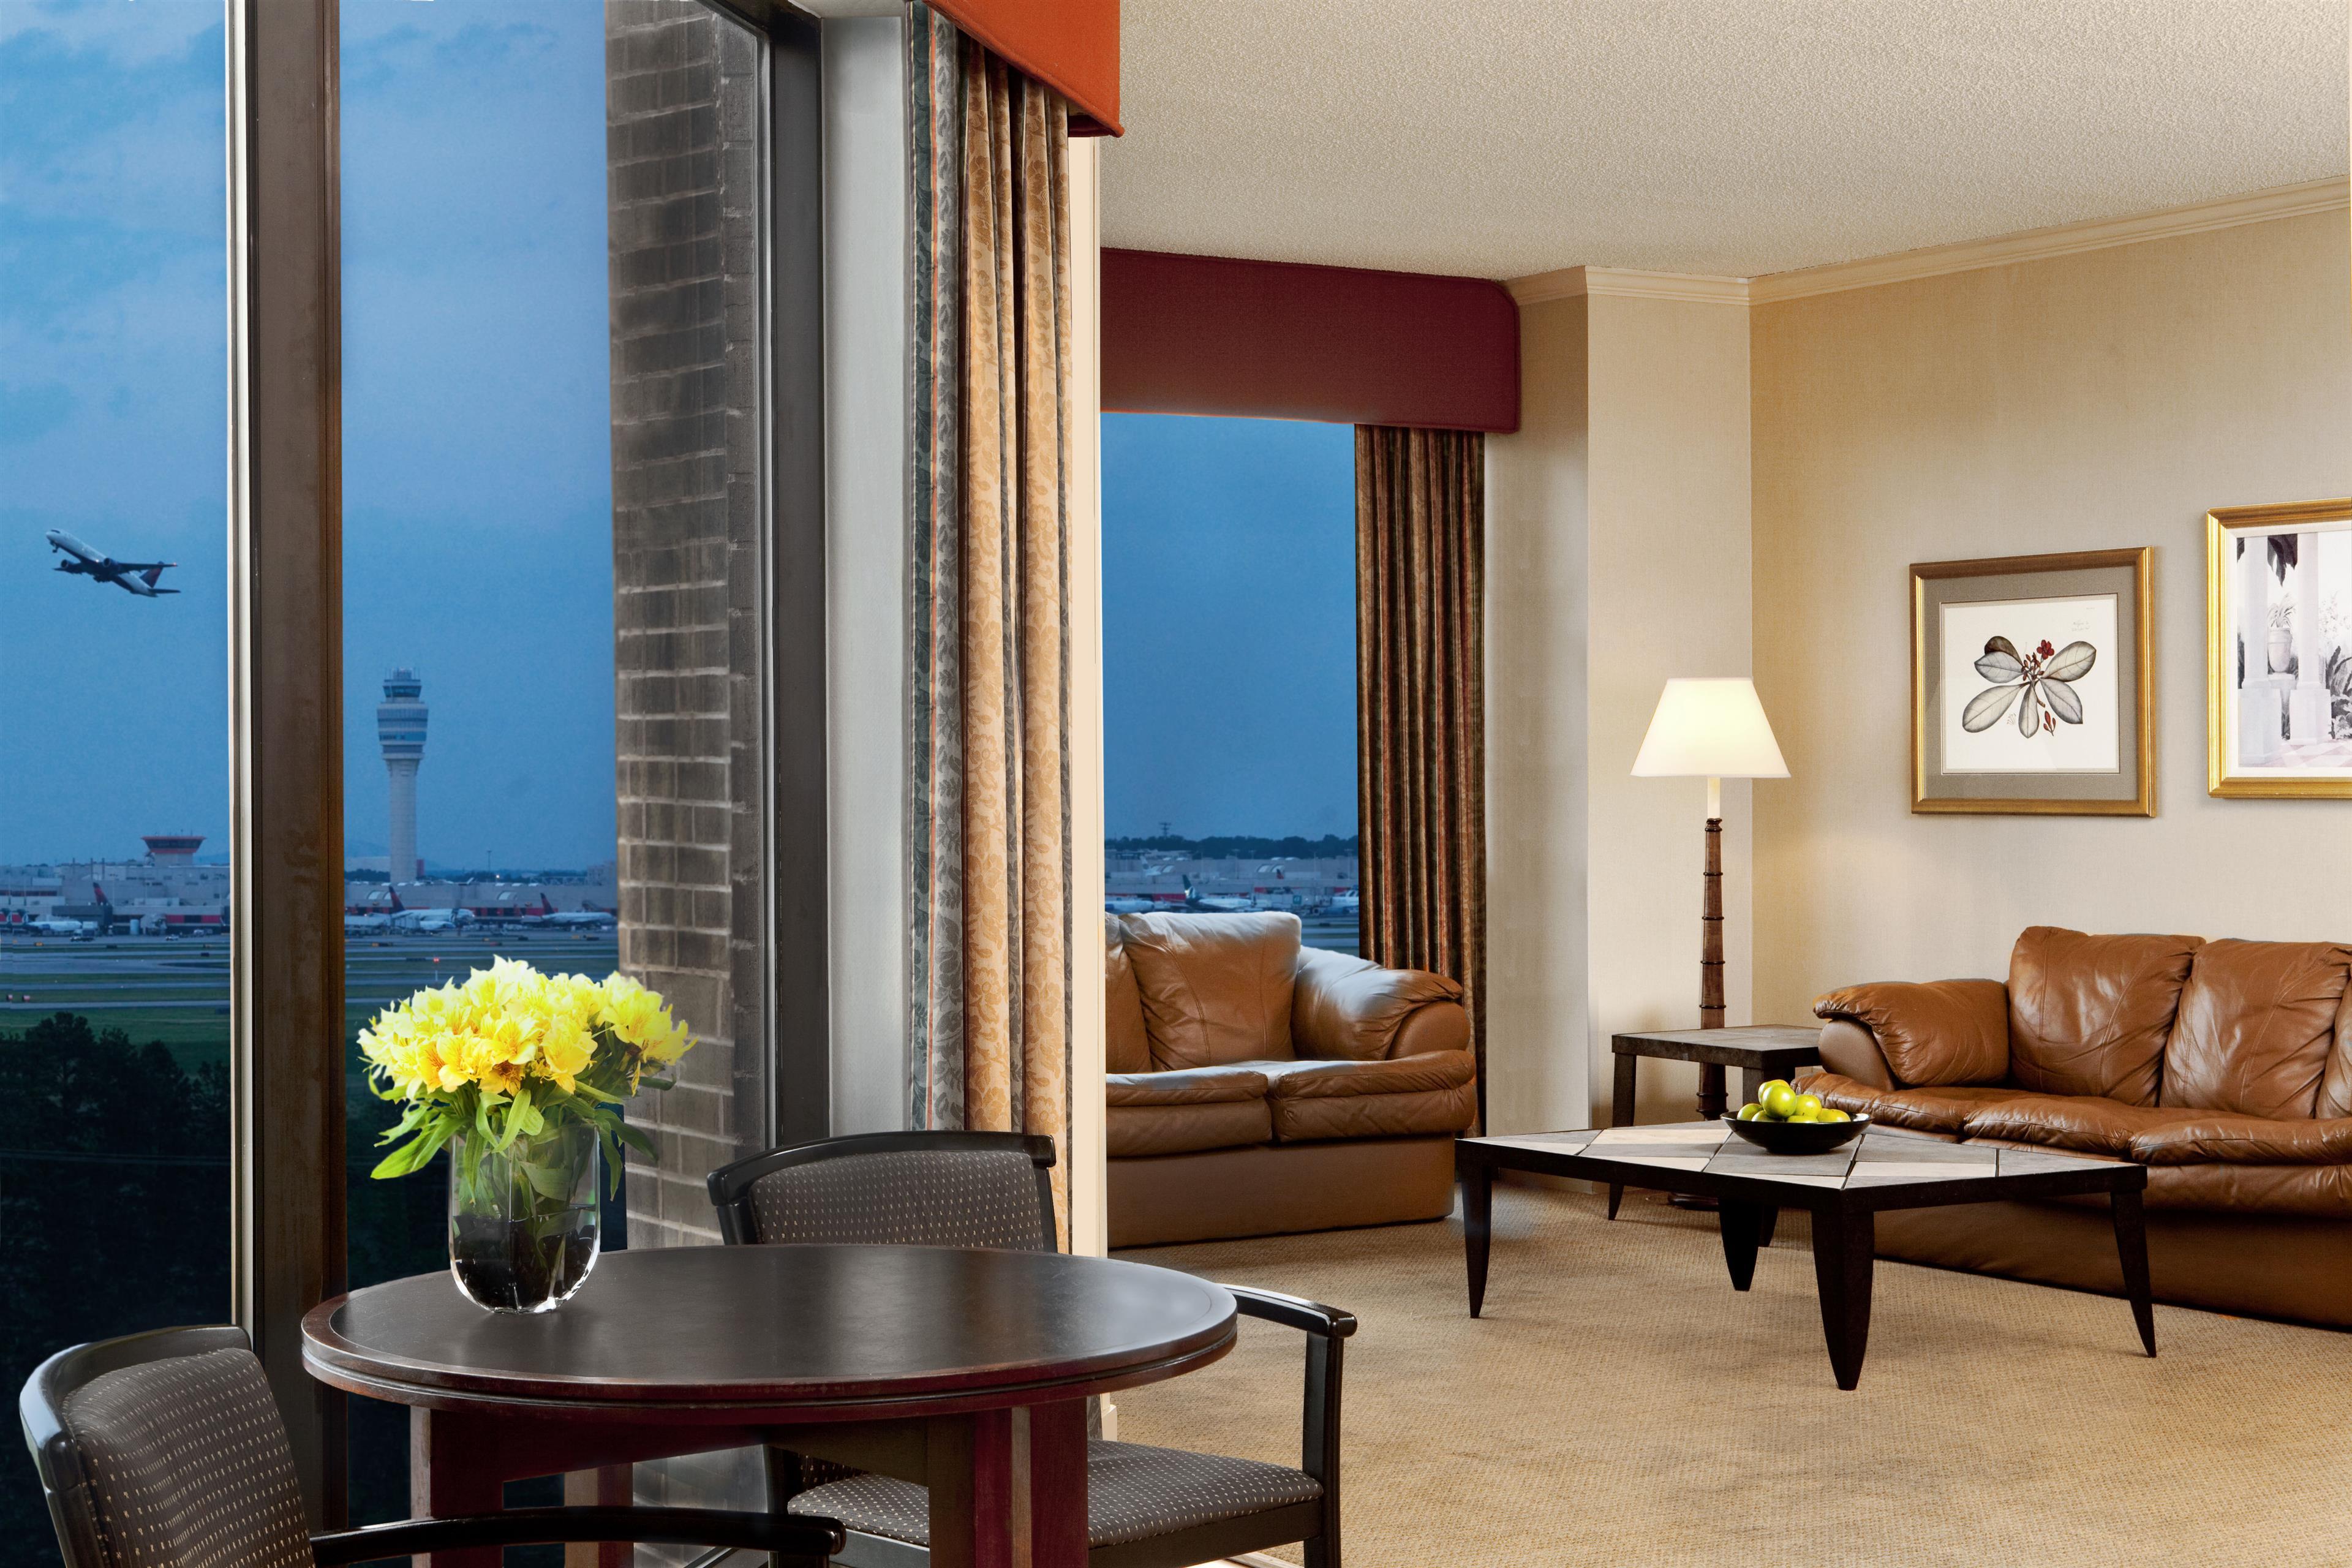 Sheraton Atlanta Airport Hotel image 13